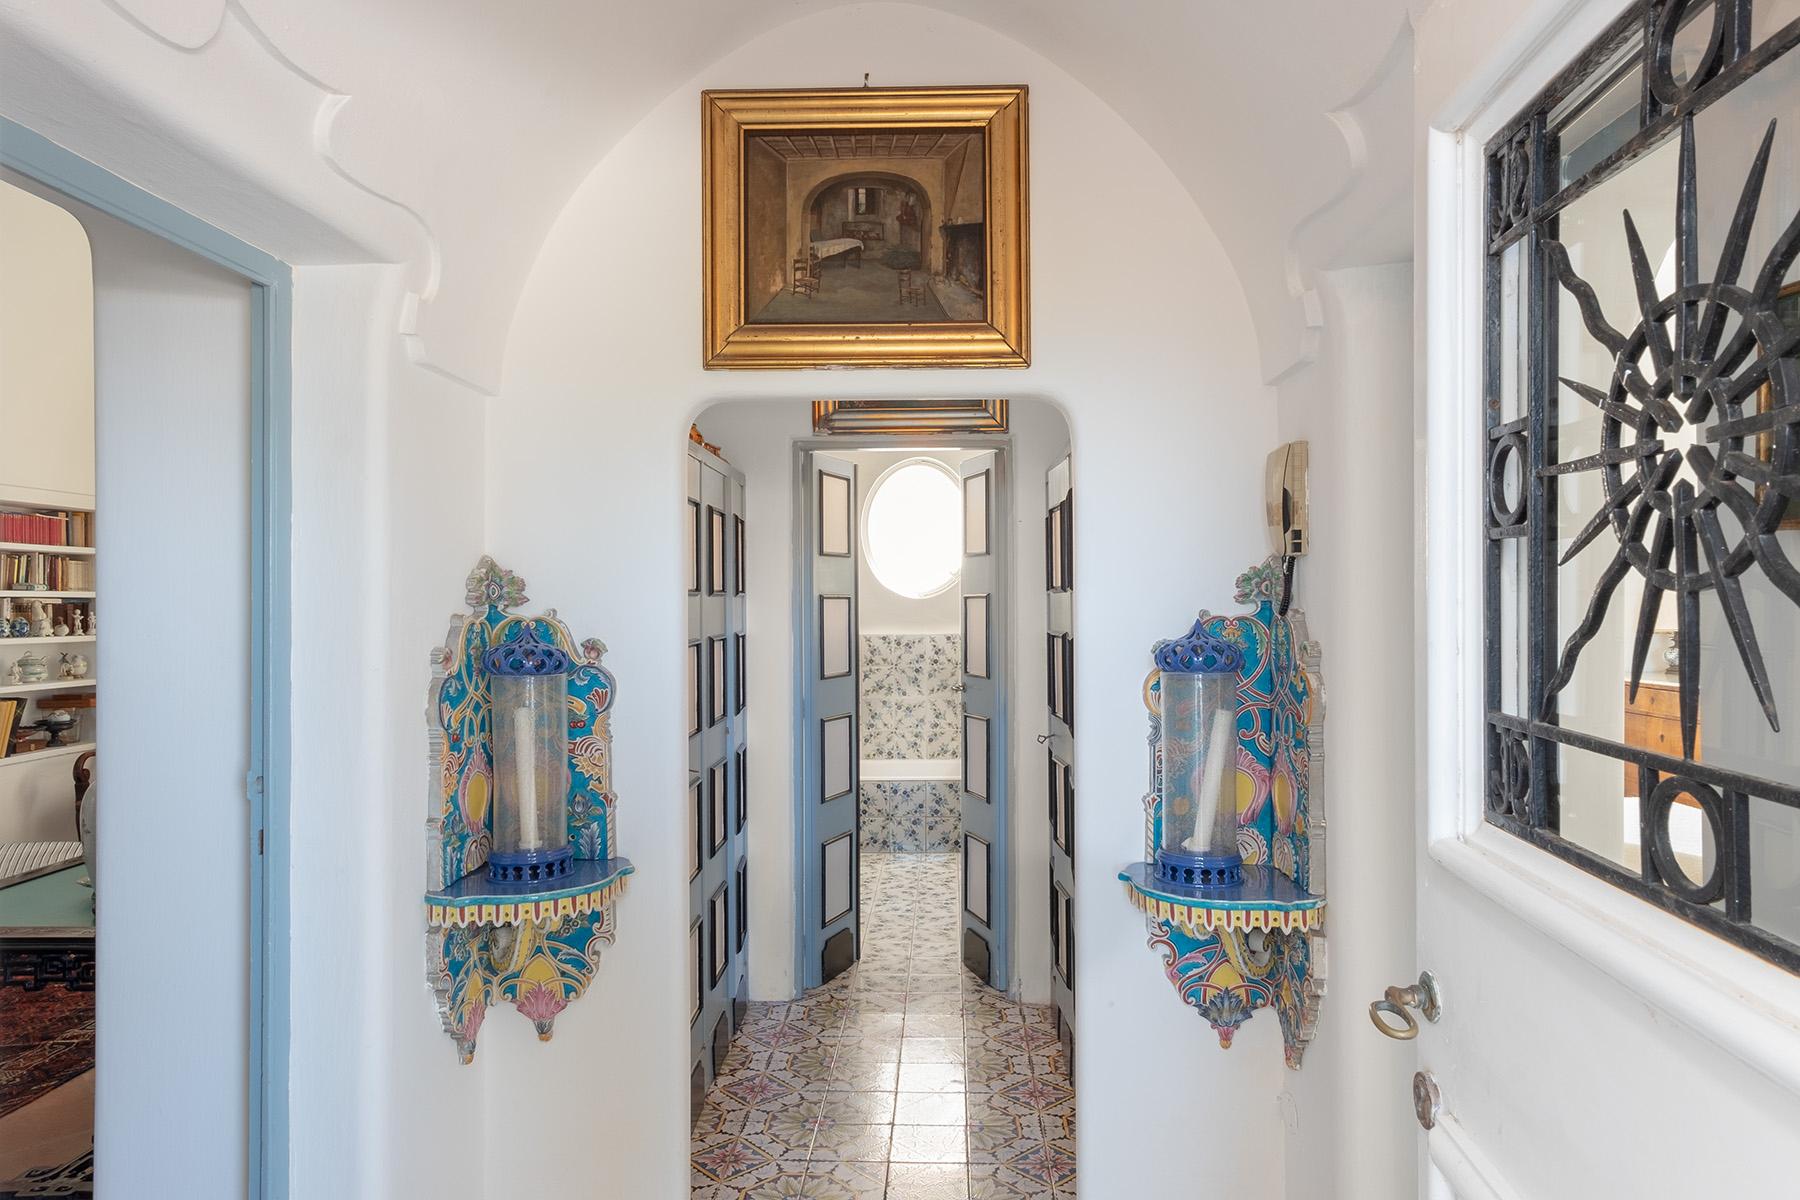 Casa indipendente in Vendita a Capri: 5 locali, 300 mq - Foto 12